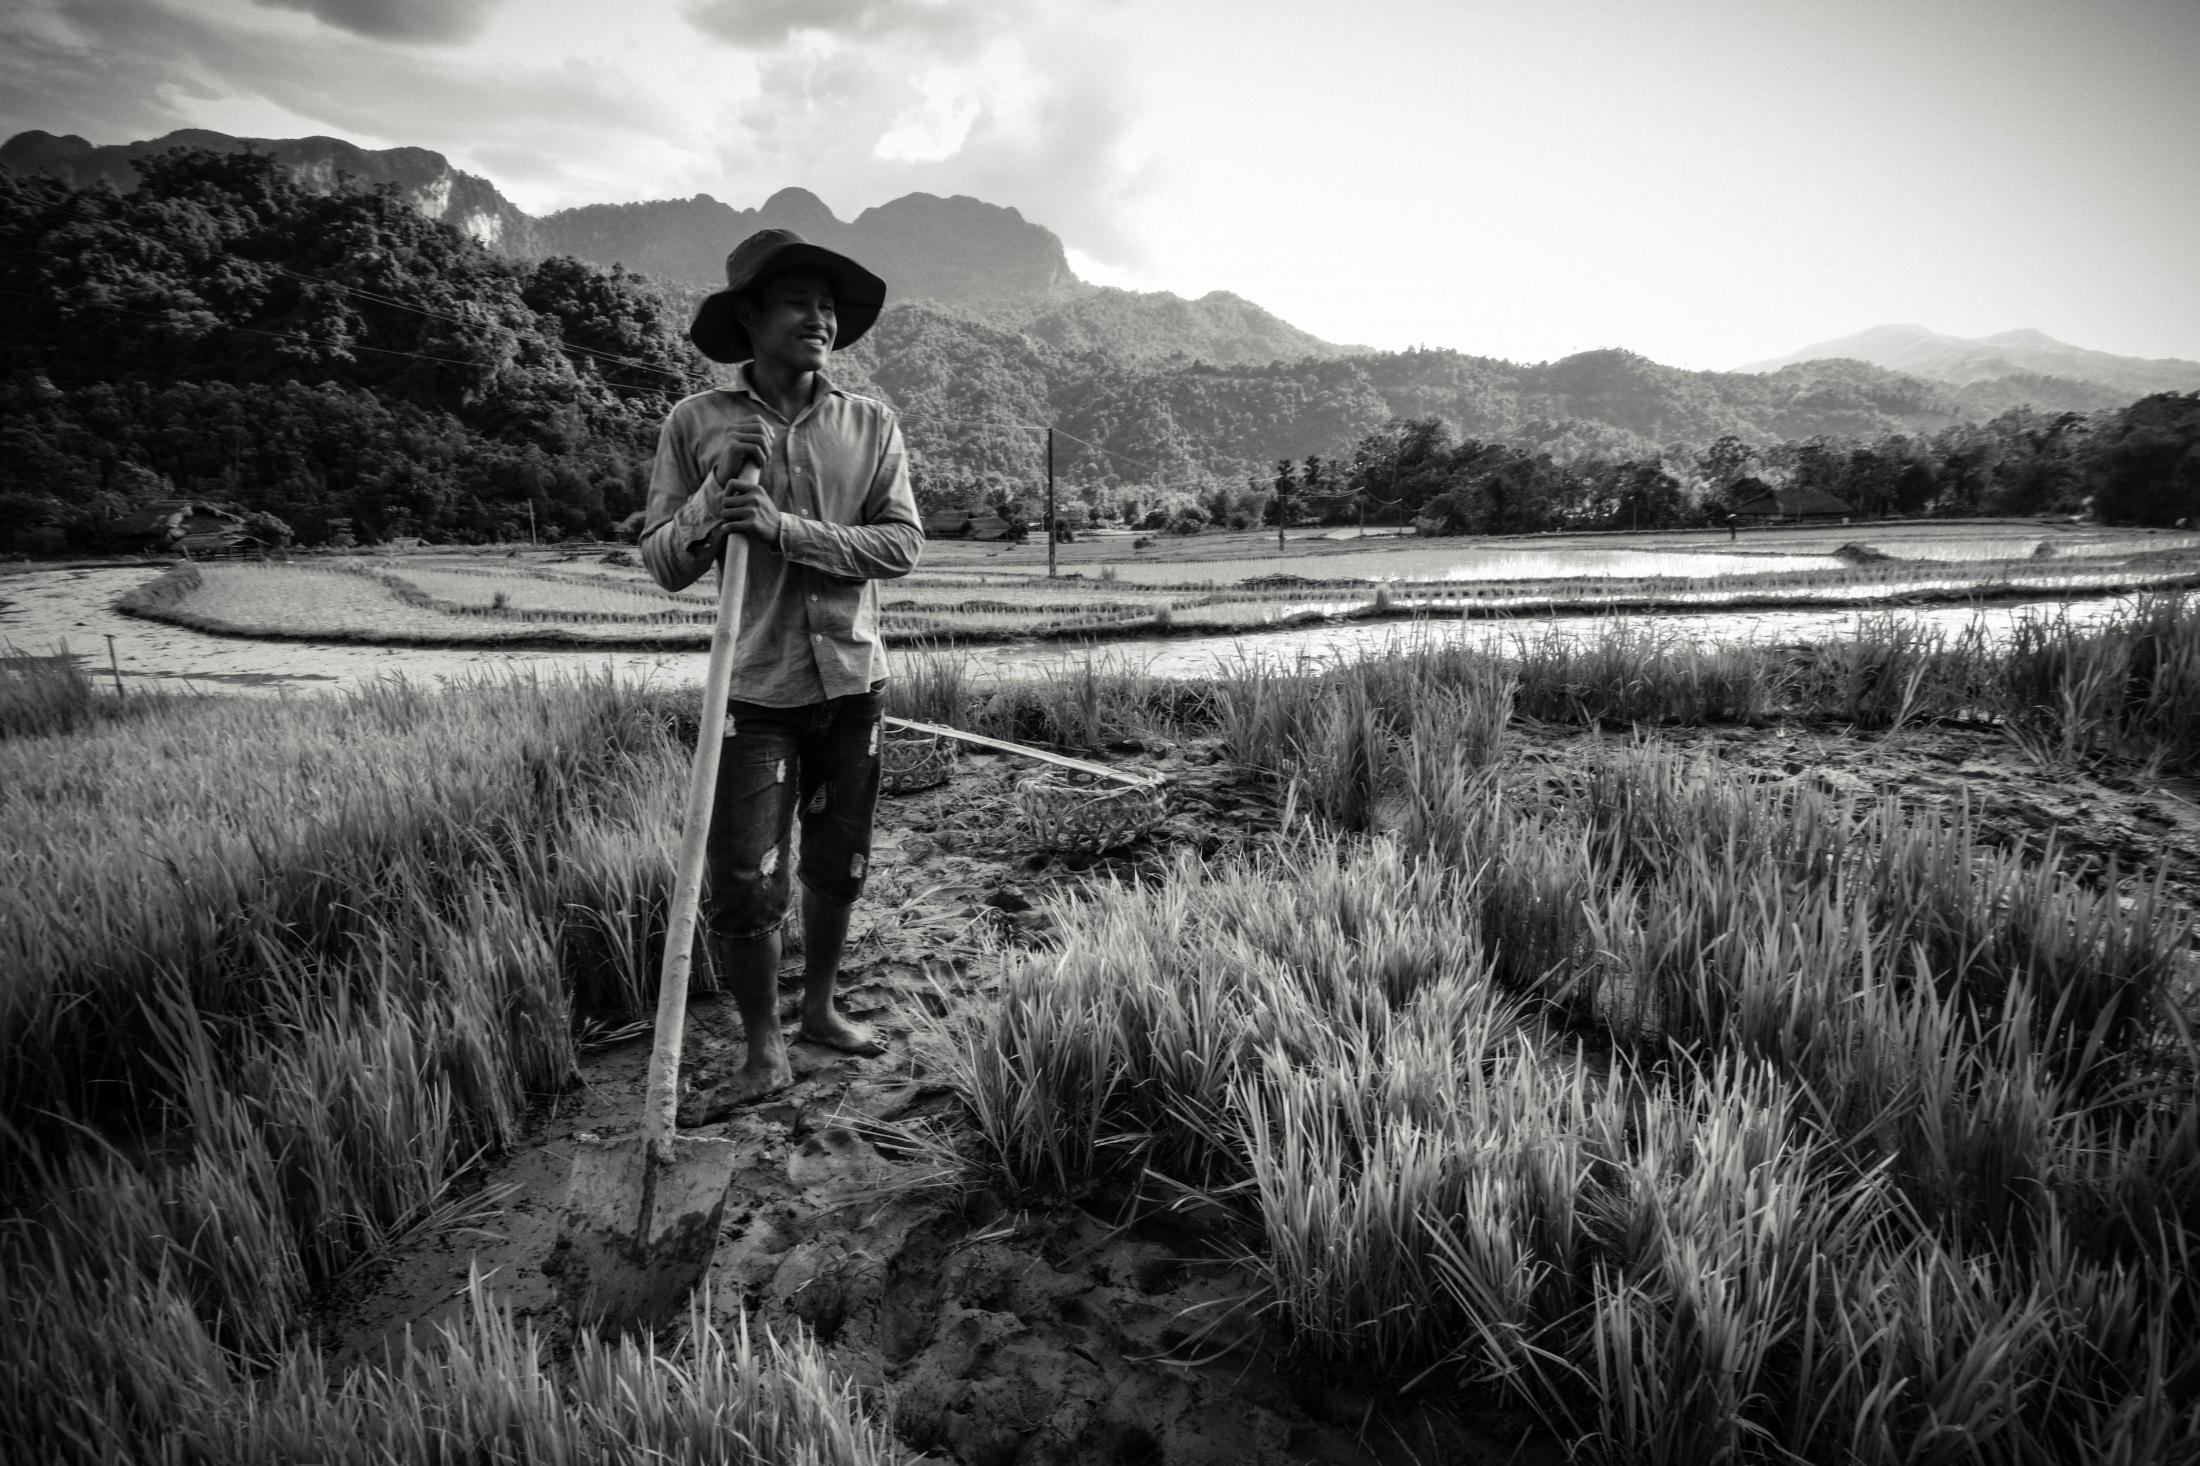 <p>Field Worker, Yen Dinh, Vietnam</p>